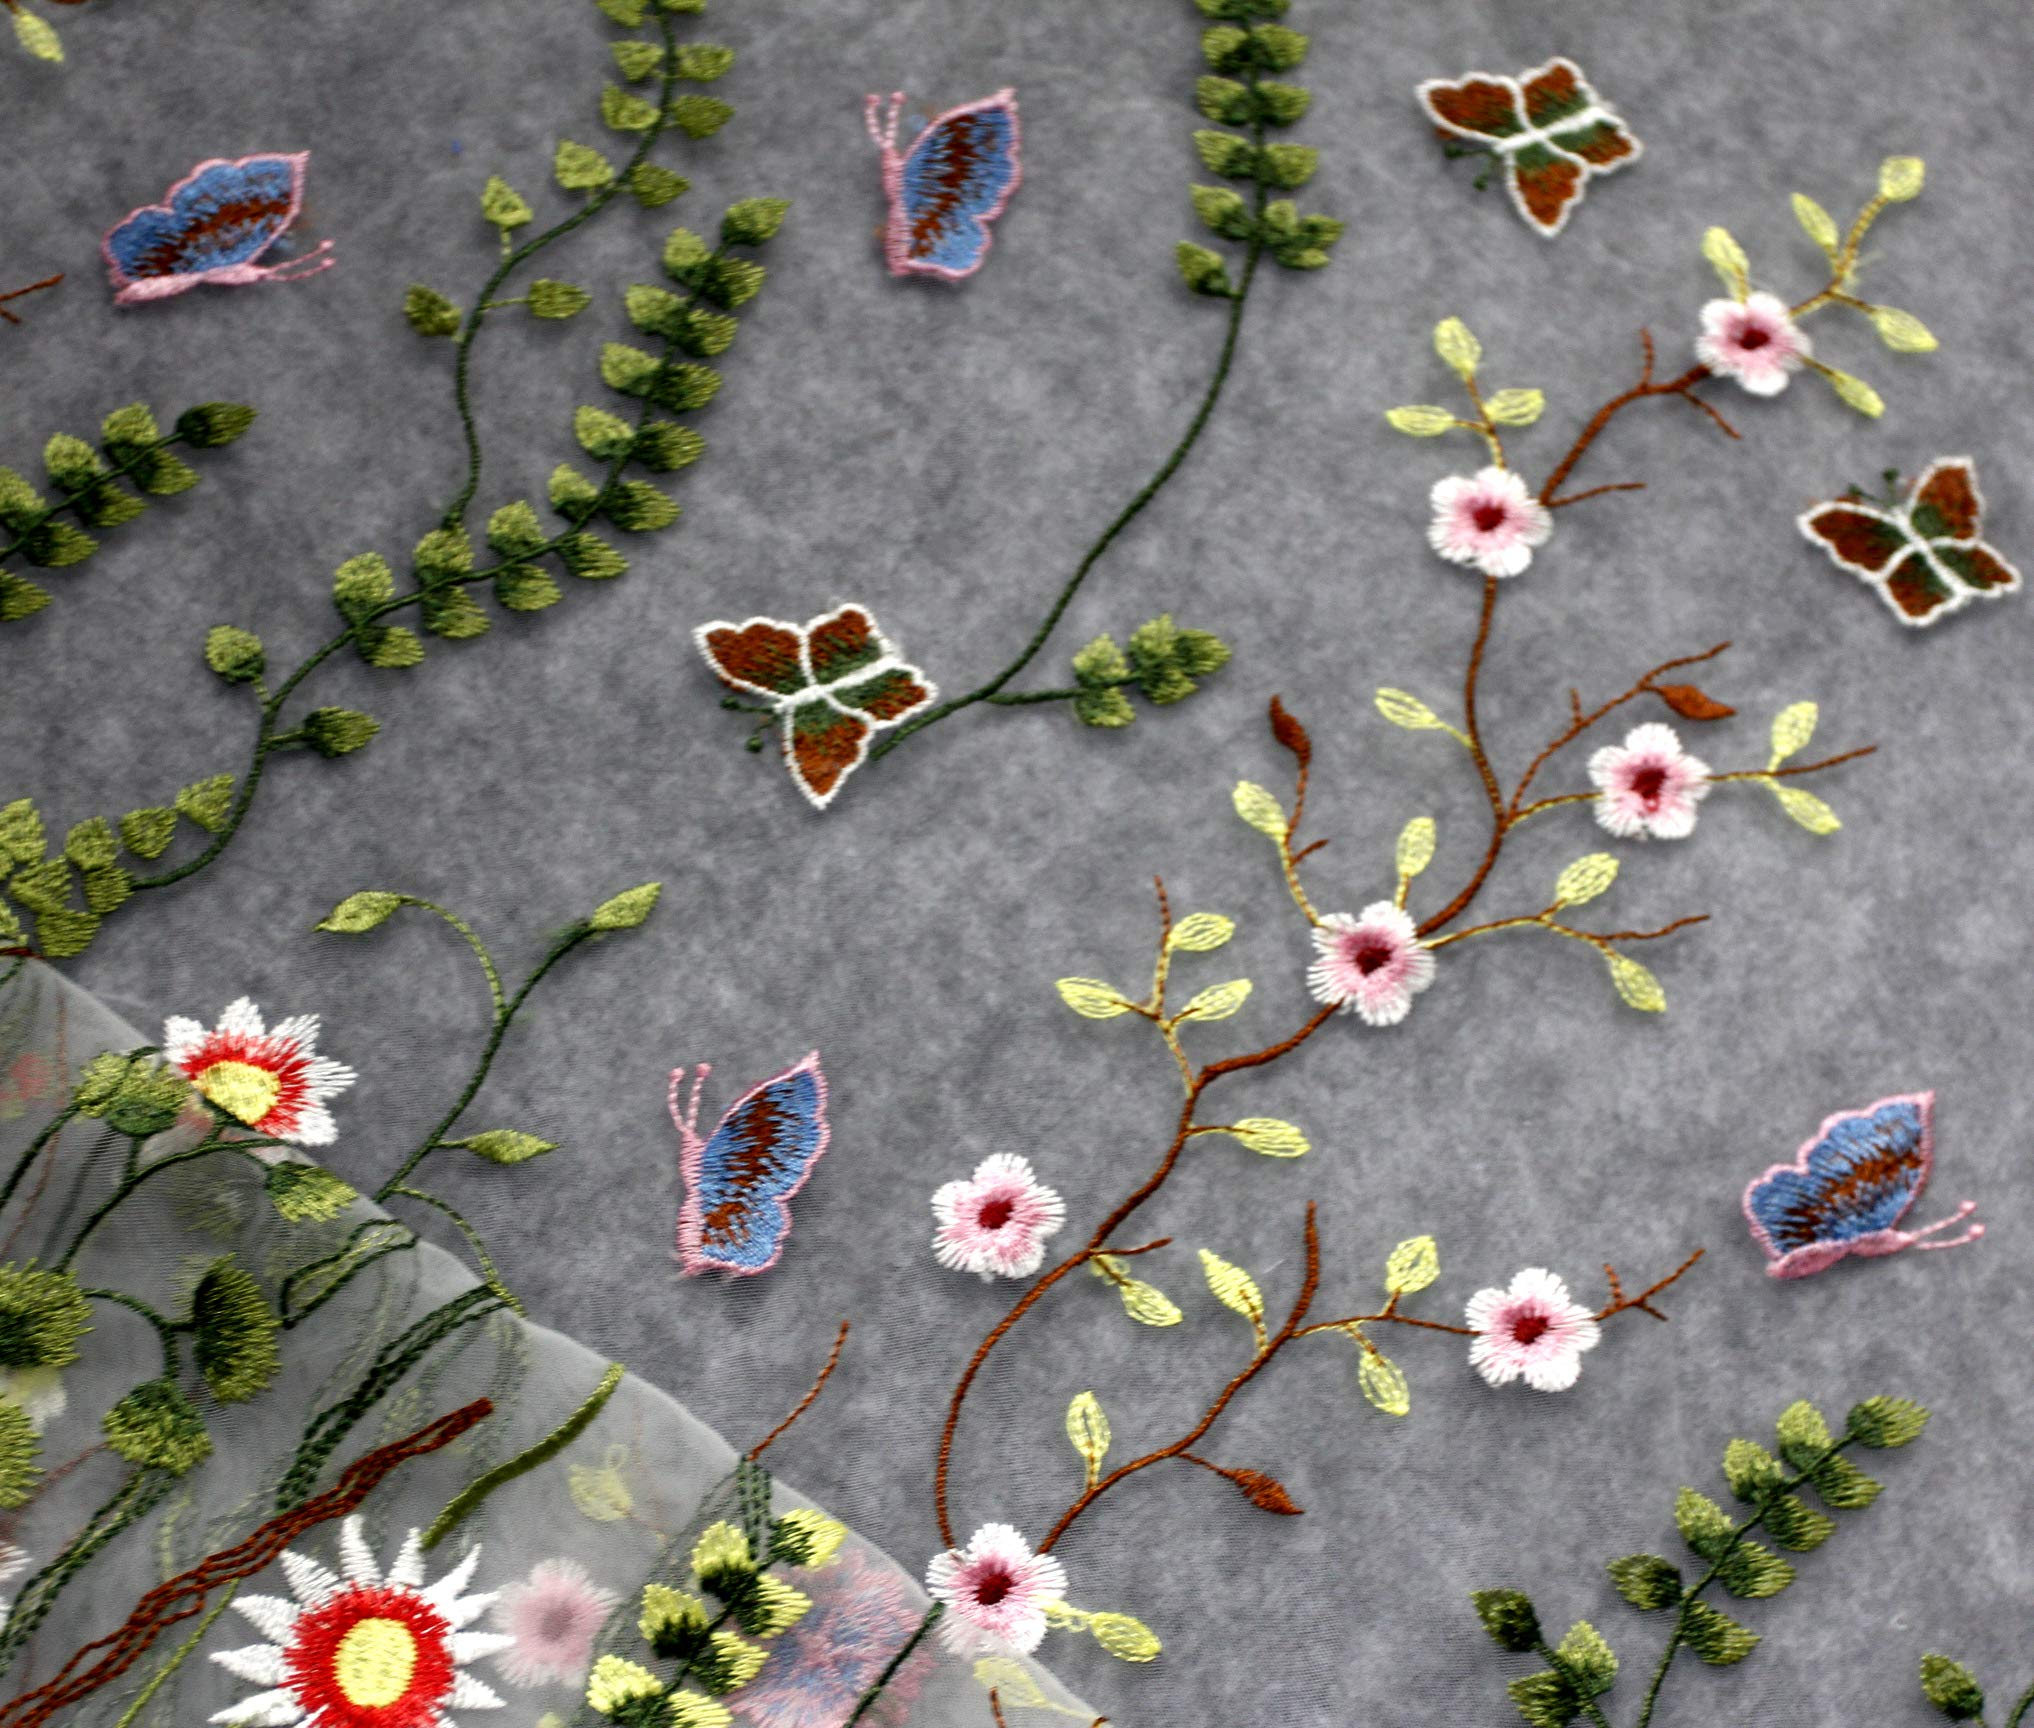 De.De Embroidery Colorful Flower Lace Trim for Wedding Dress Decor 1X1.5m Embroidered Lace Fabrics